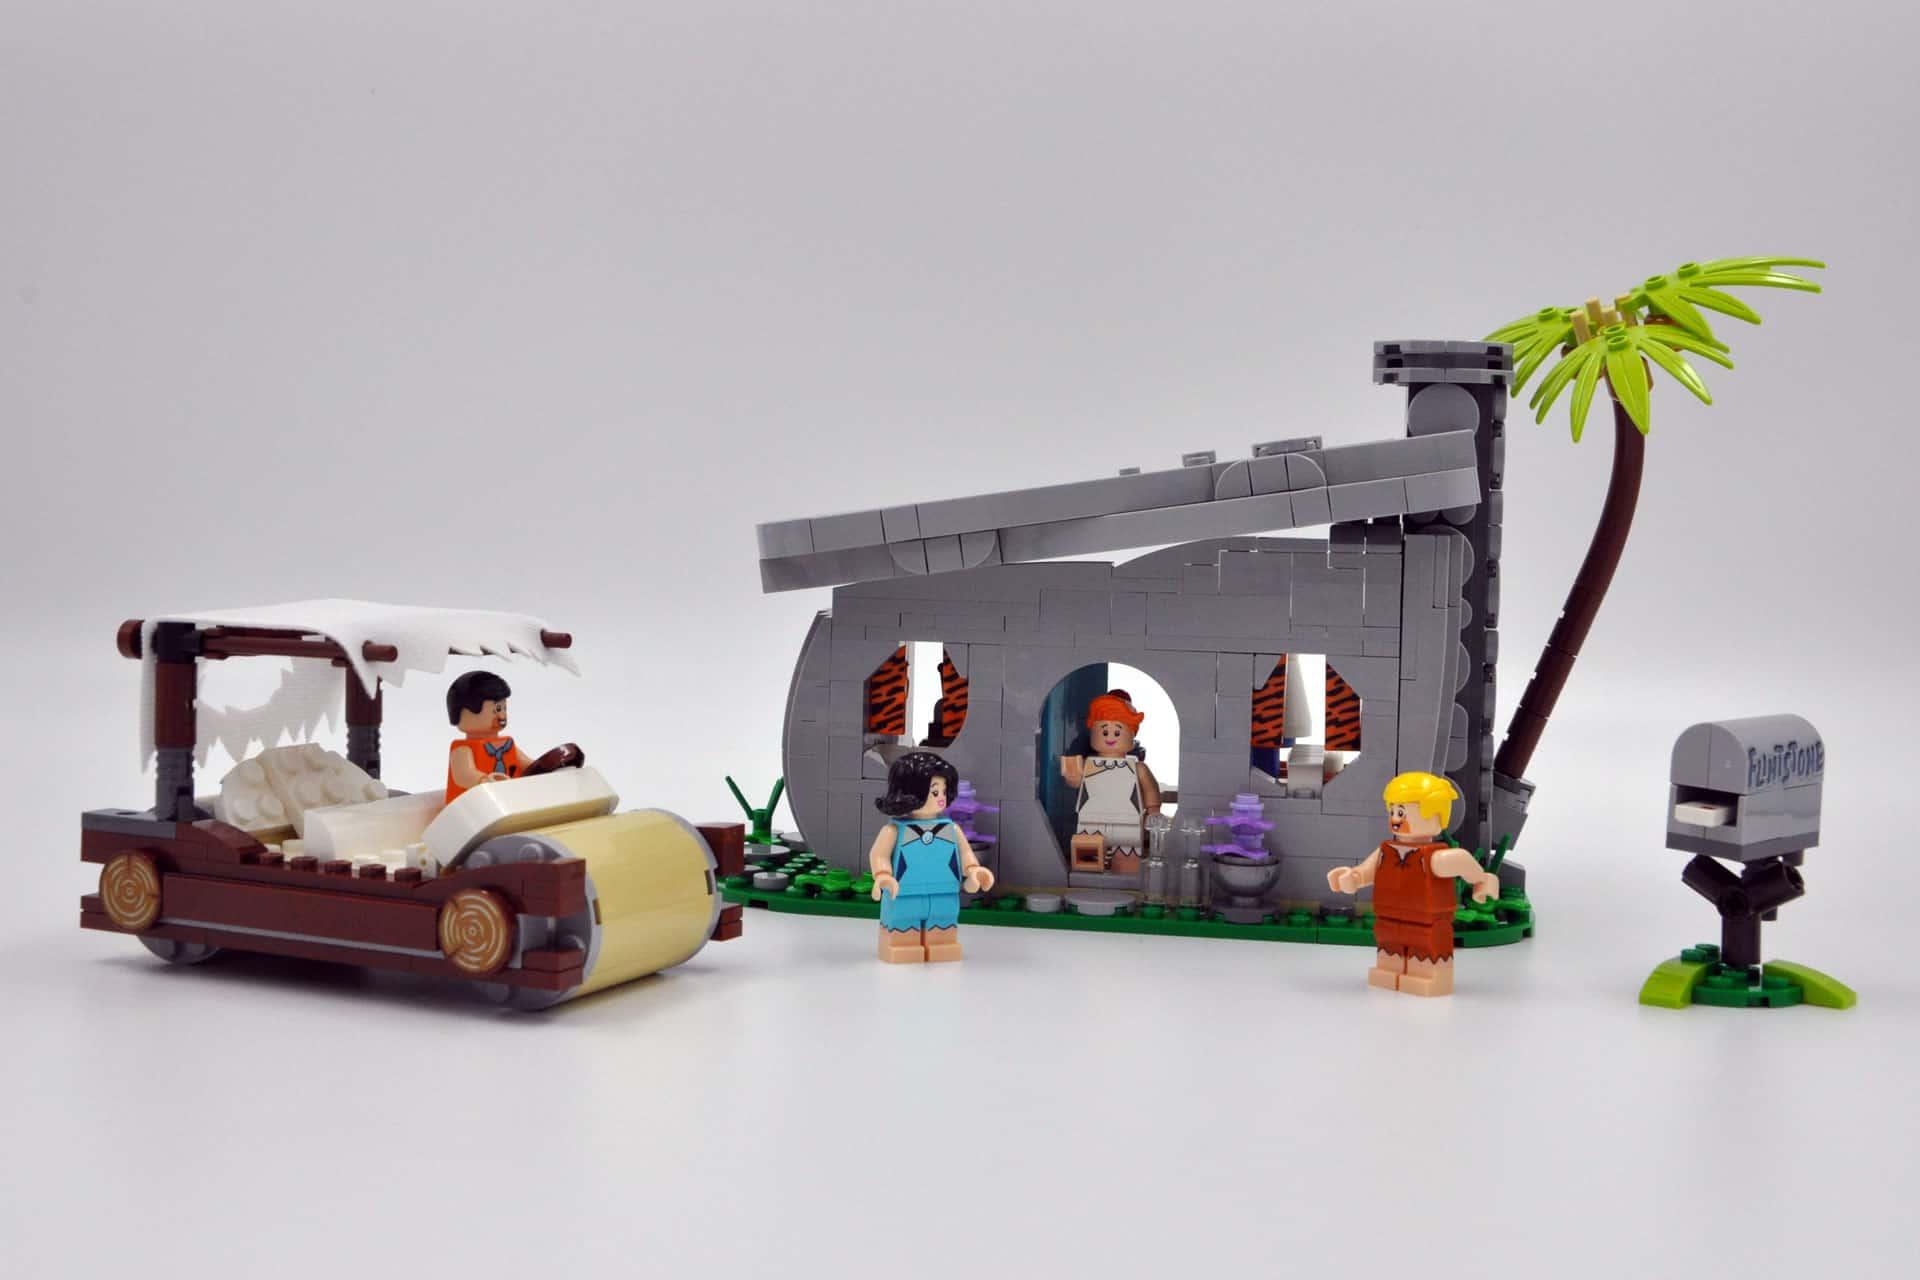 LEGO 21316 The Flintstones - Fertiges Set